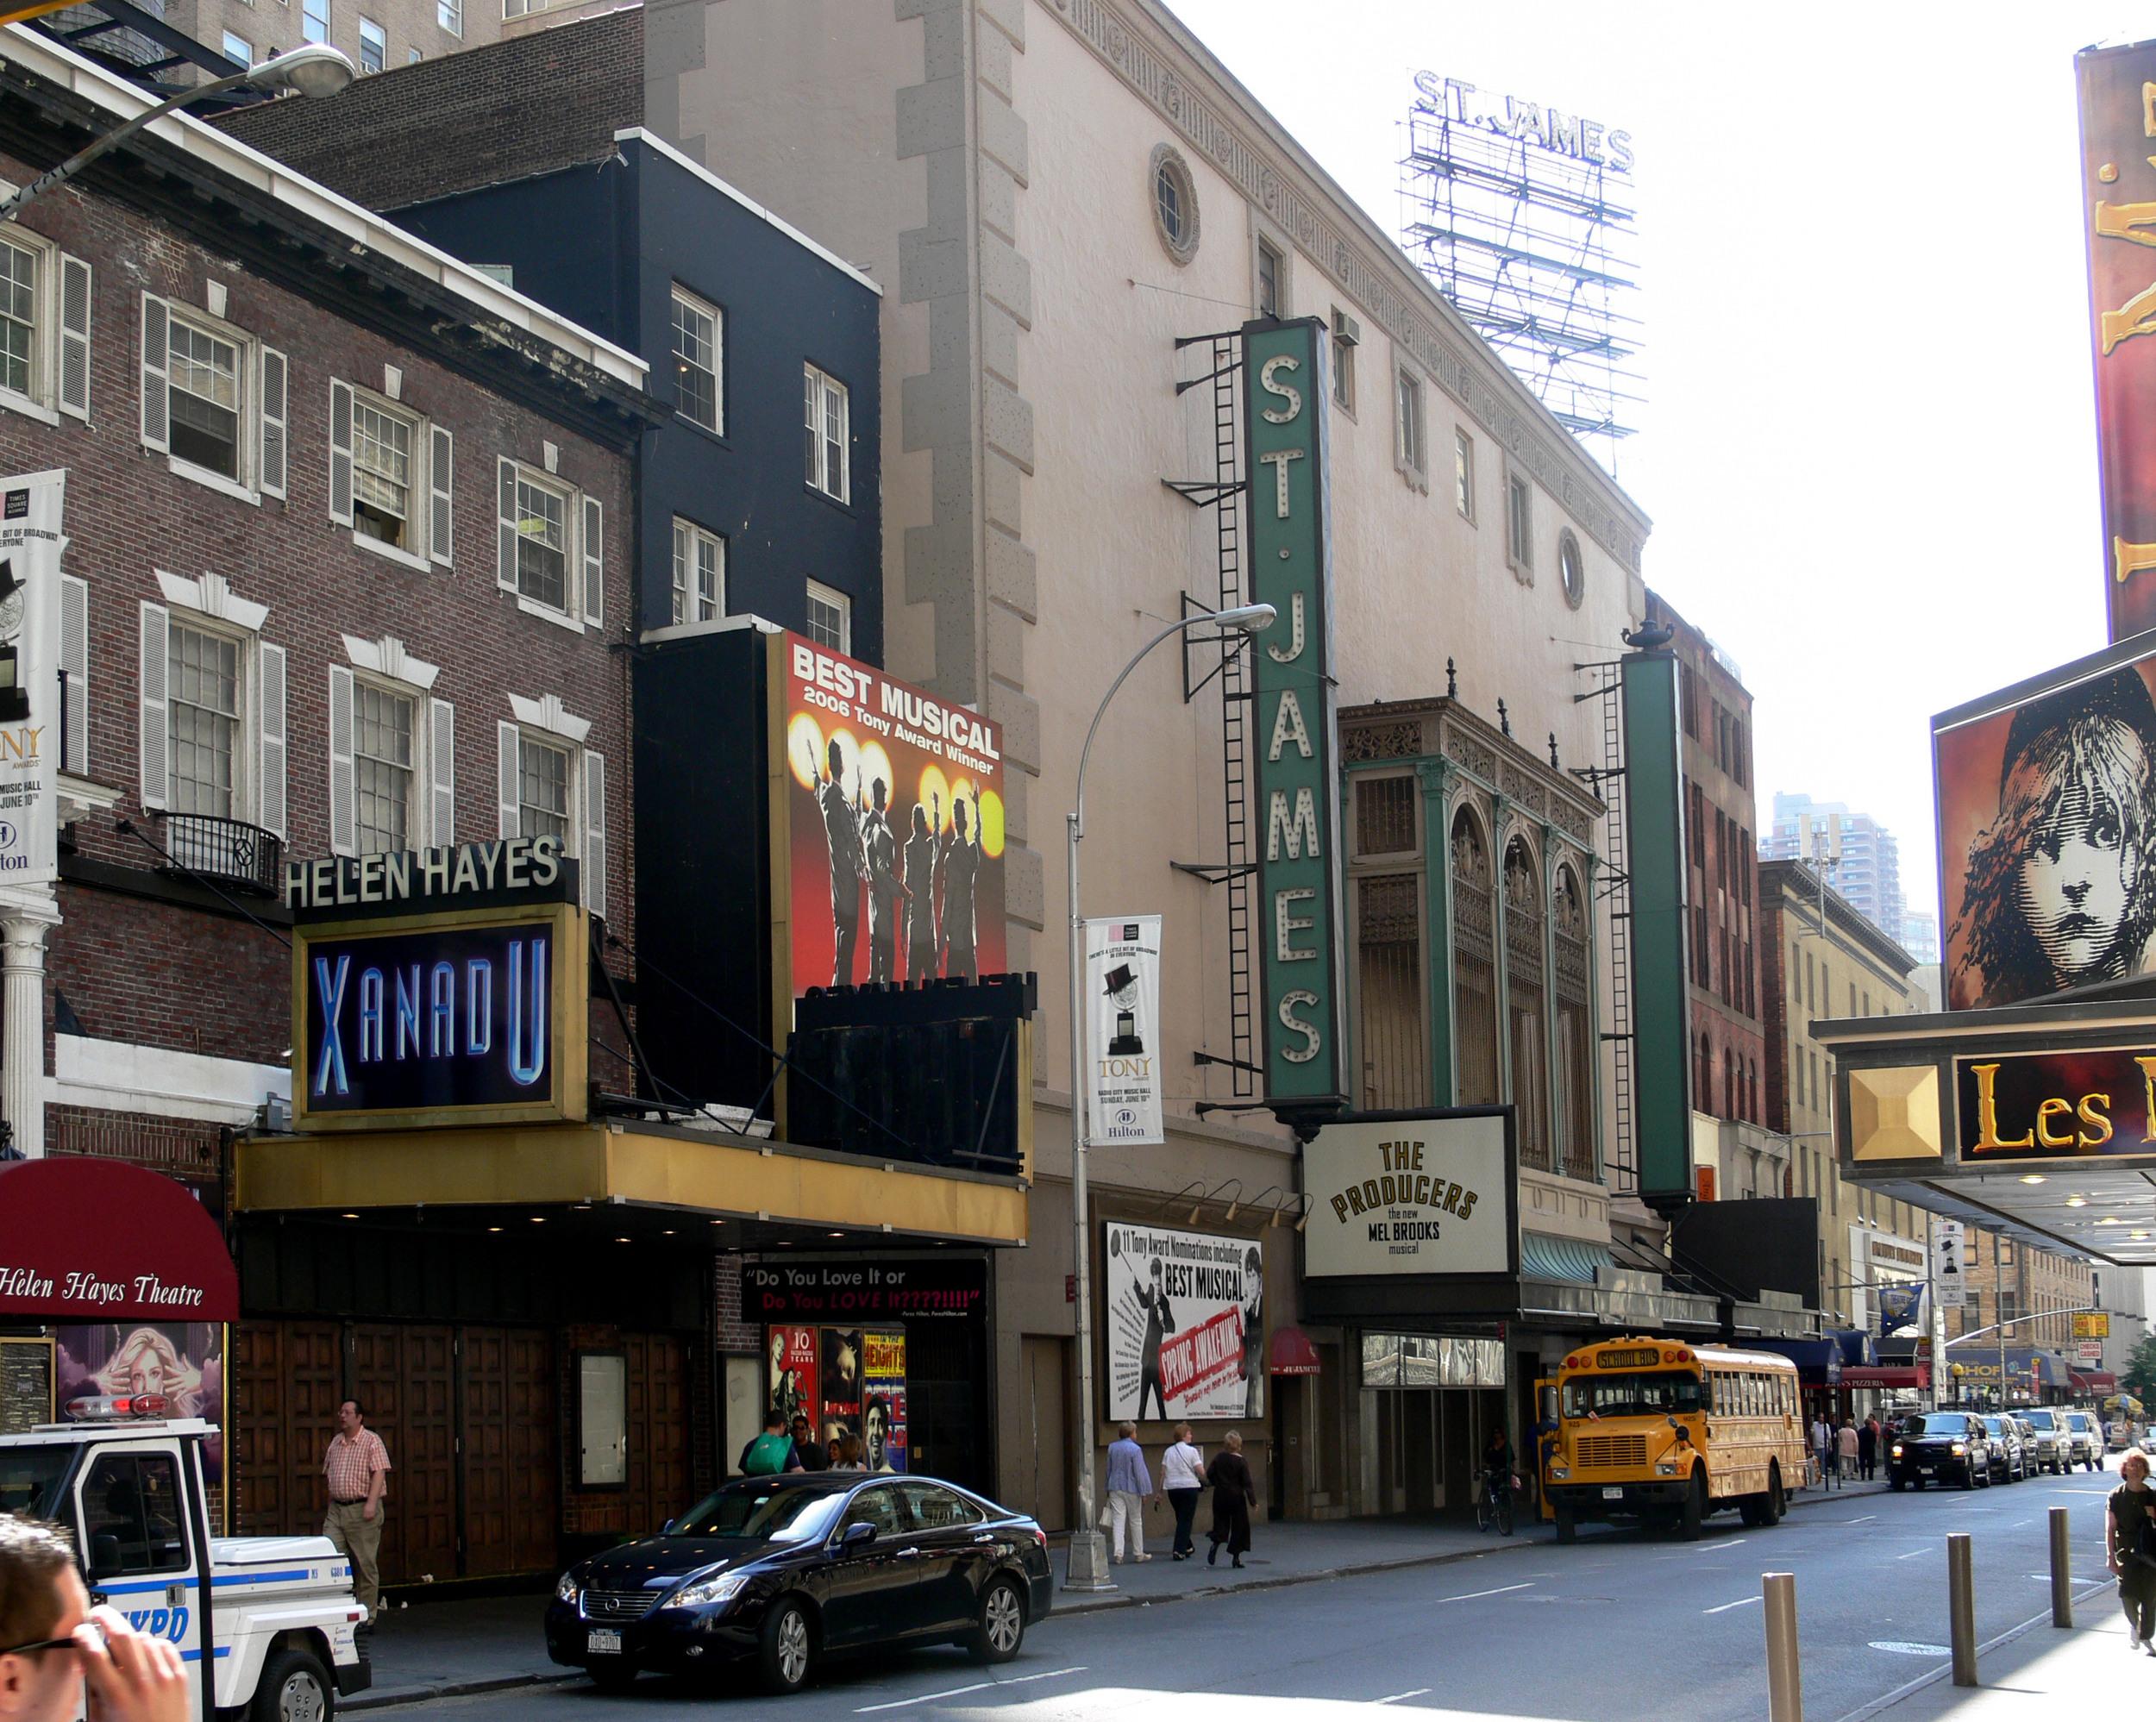 St_James_Theatre_NYC_2007.jpg